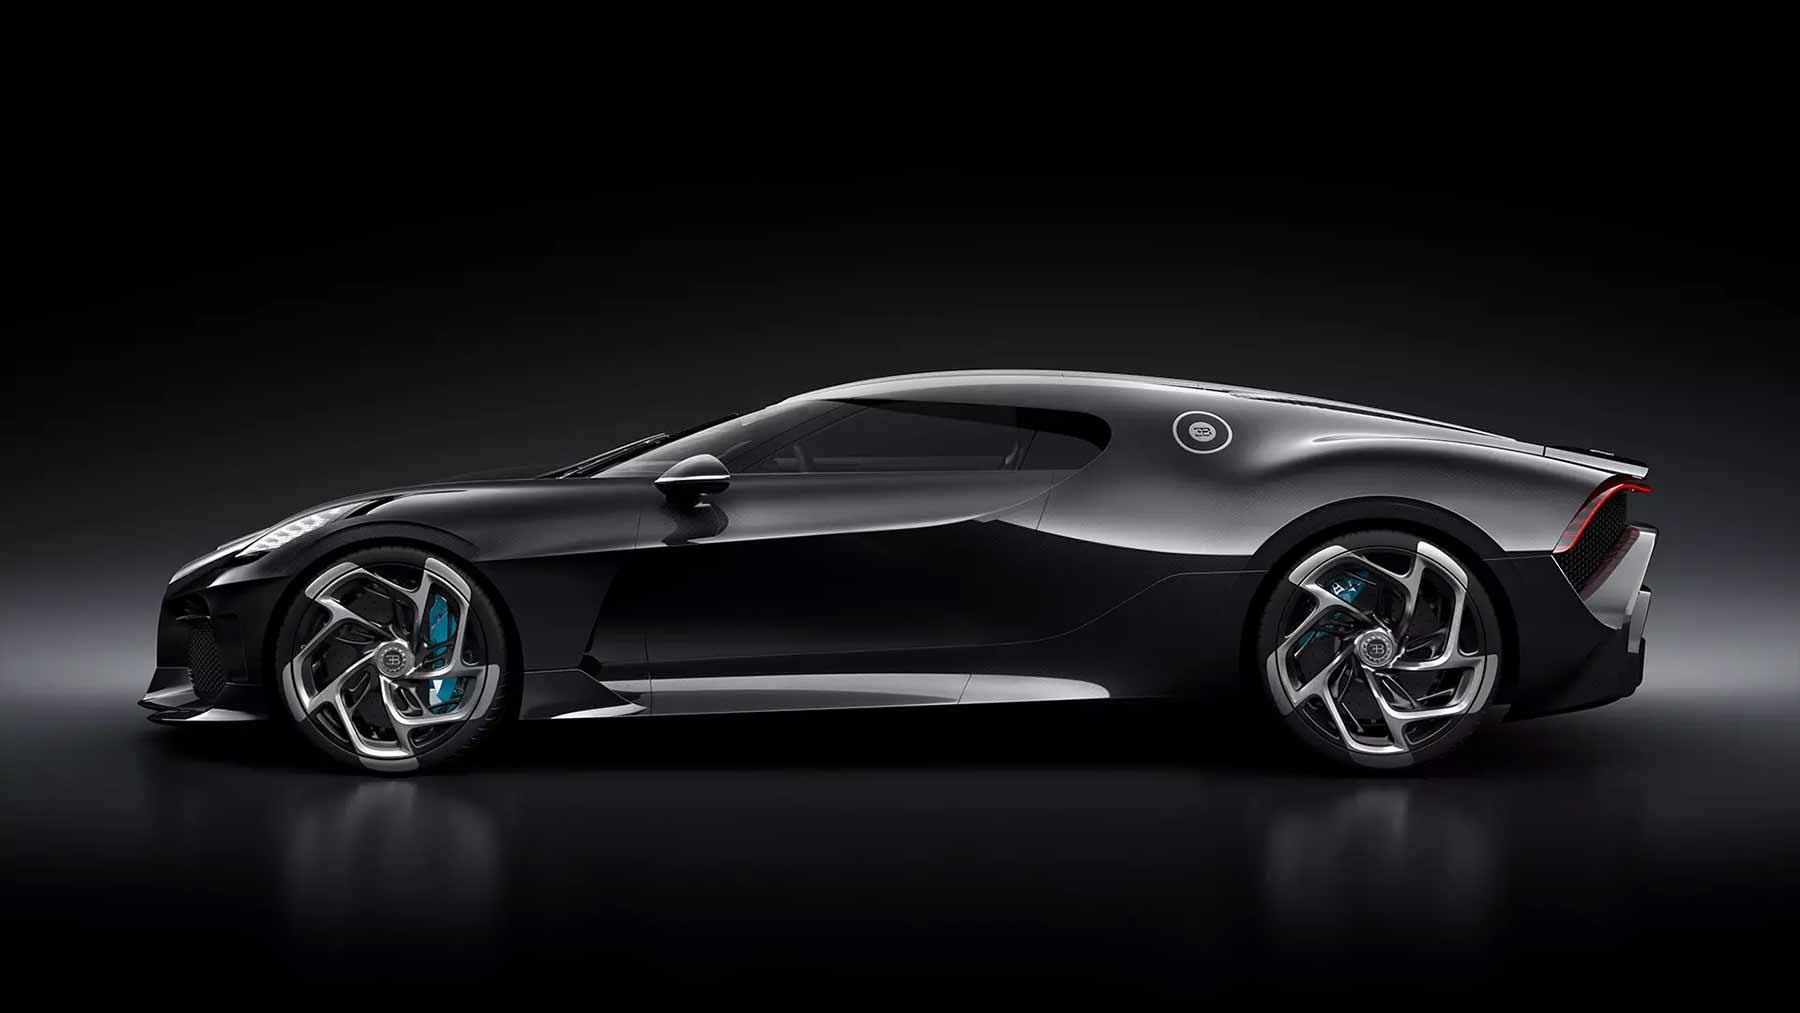 Bugatti La Voiture Noire Bugatti-La-Voiture-Noire_04